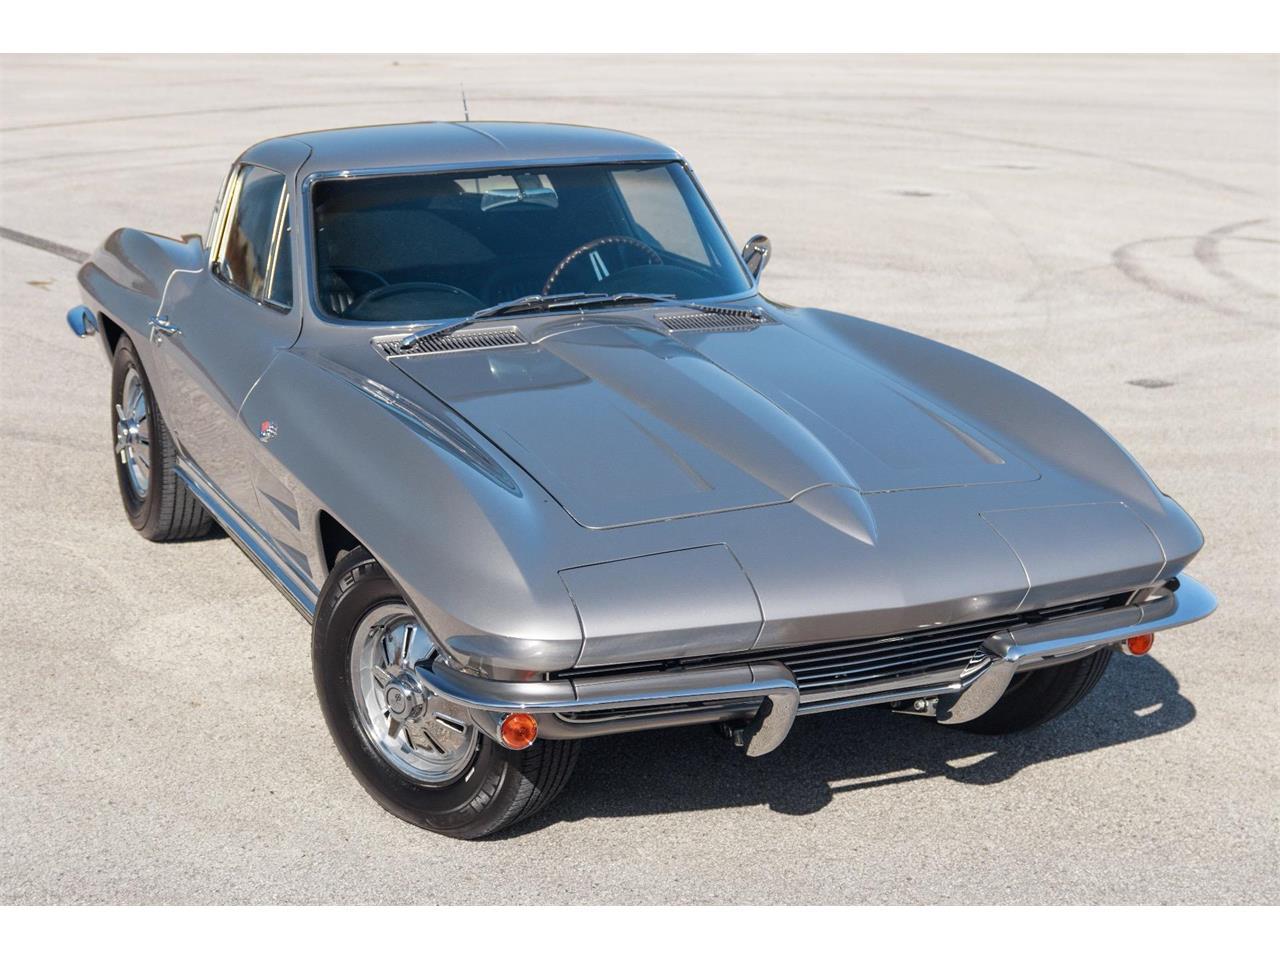 For Sale: 1964 Chevrolet Corvette Stingray in Ocala, Florida